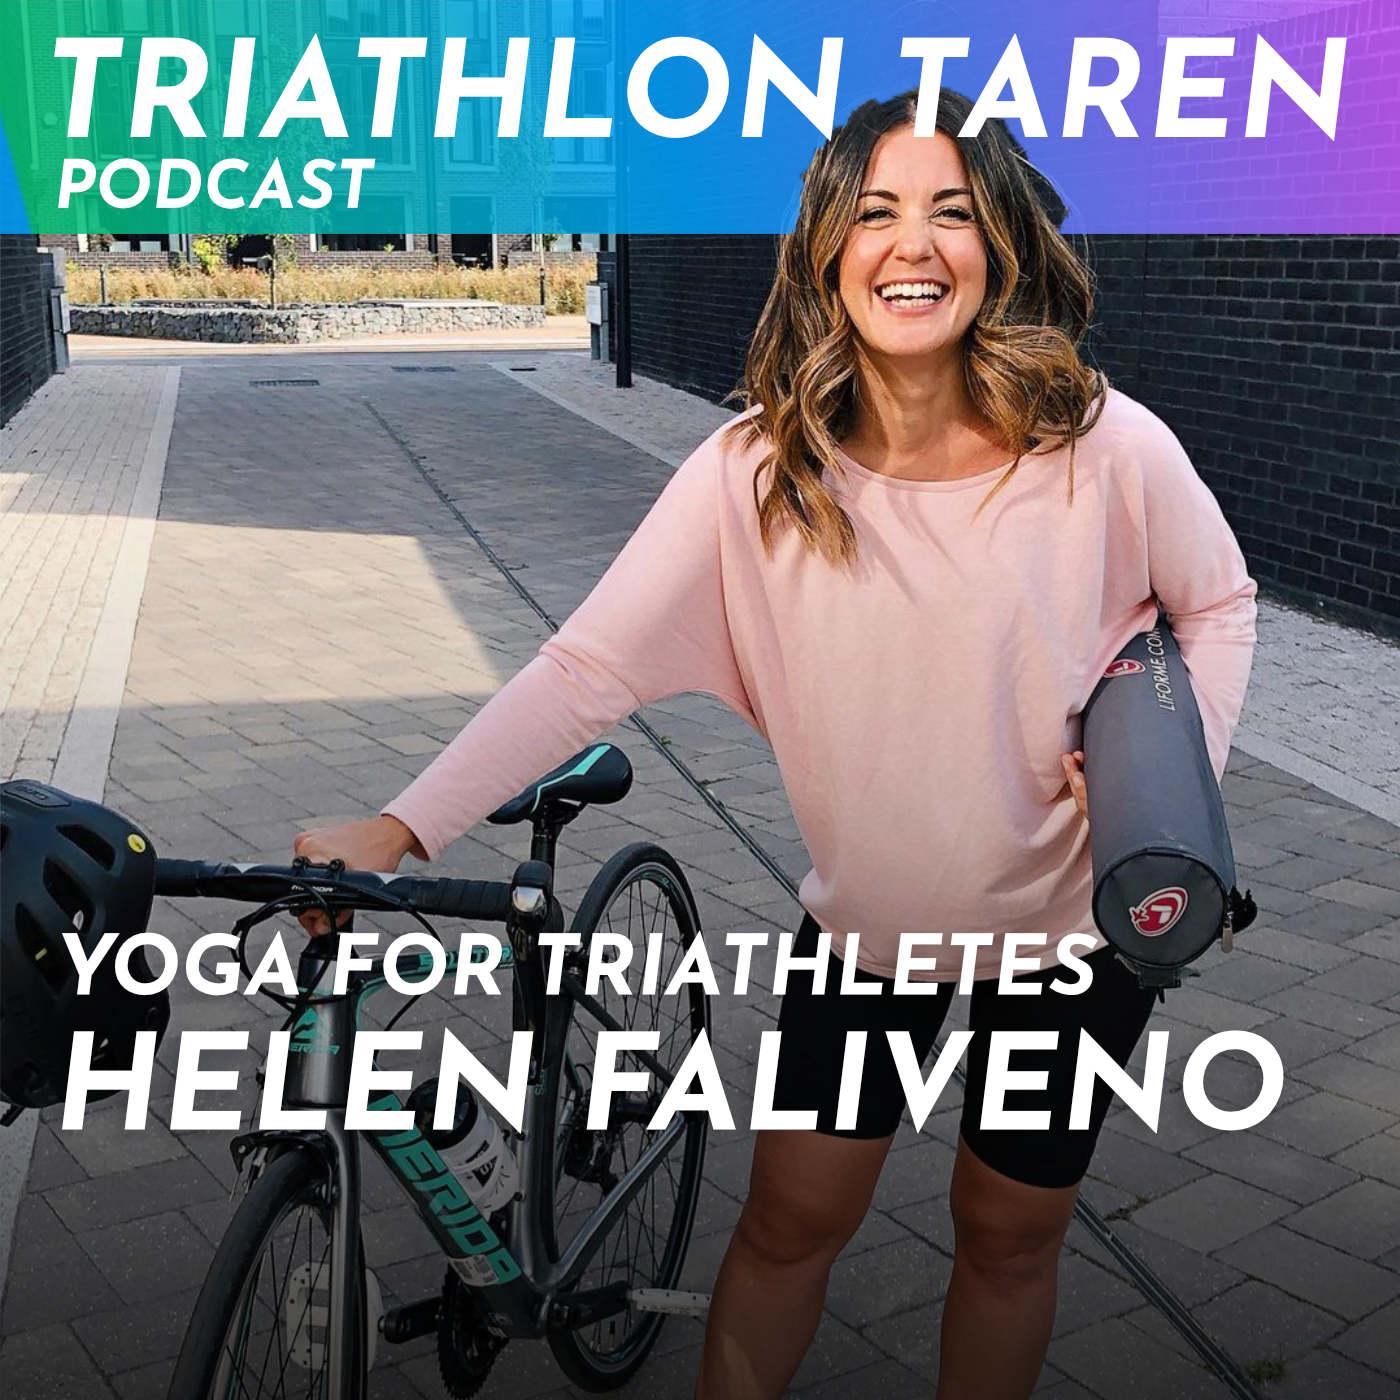 Yoga for Triathletes with Helen Faliveno